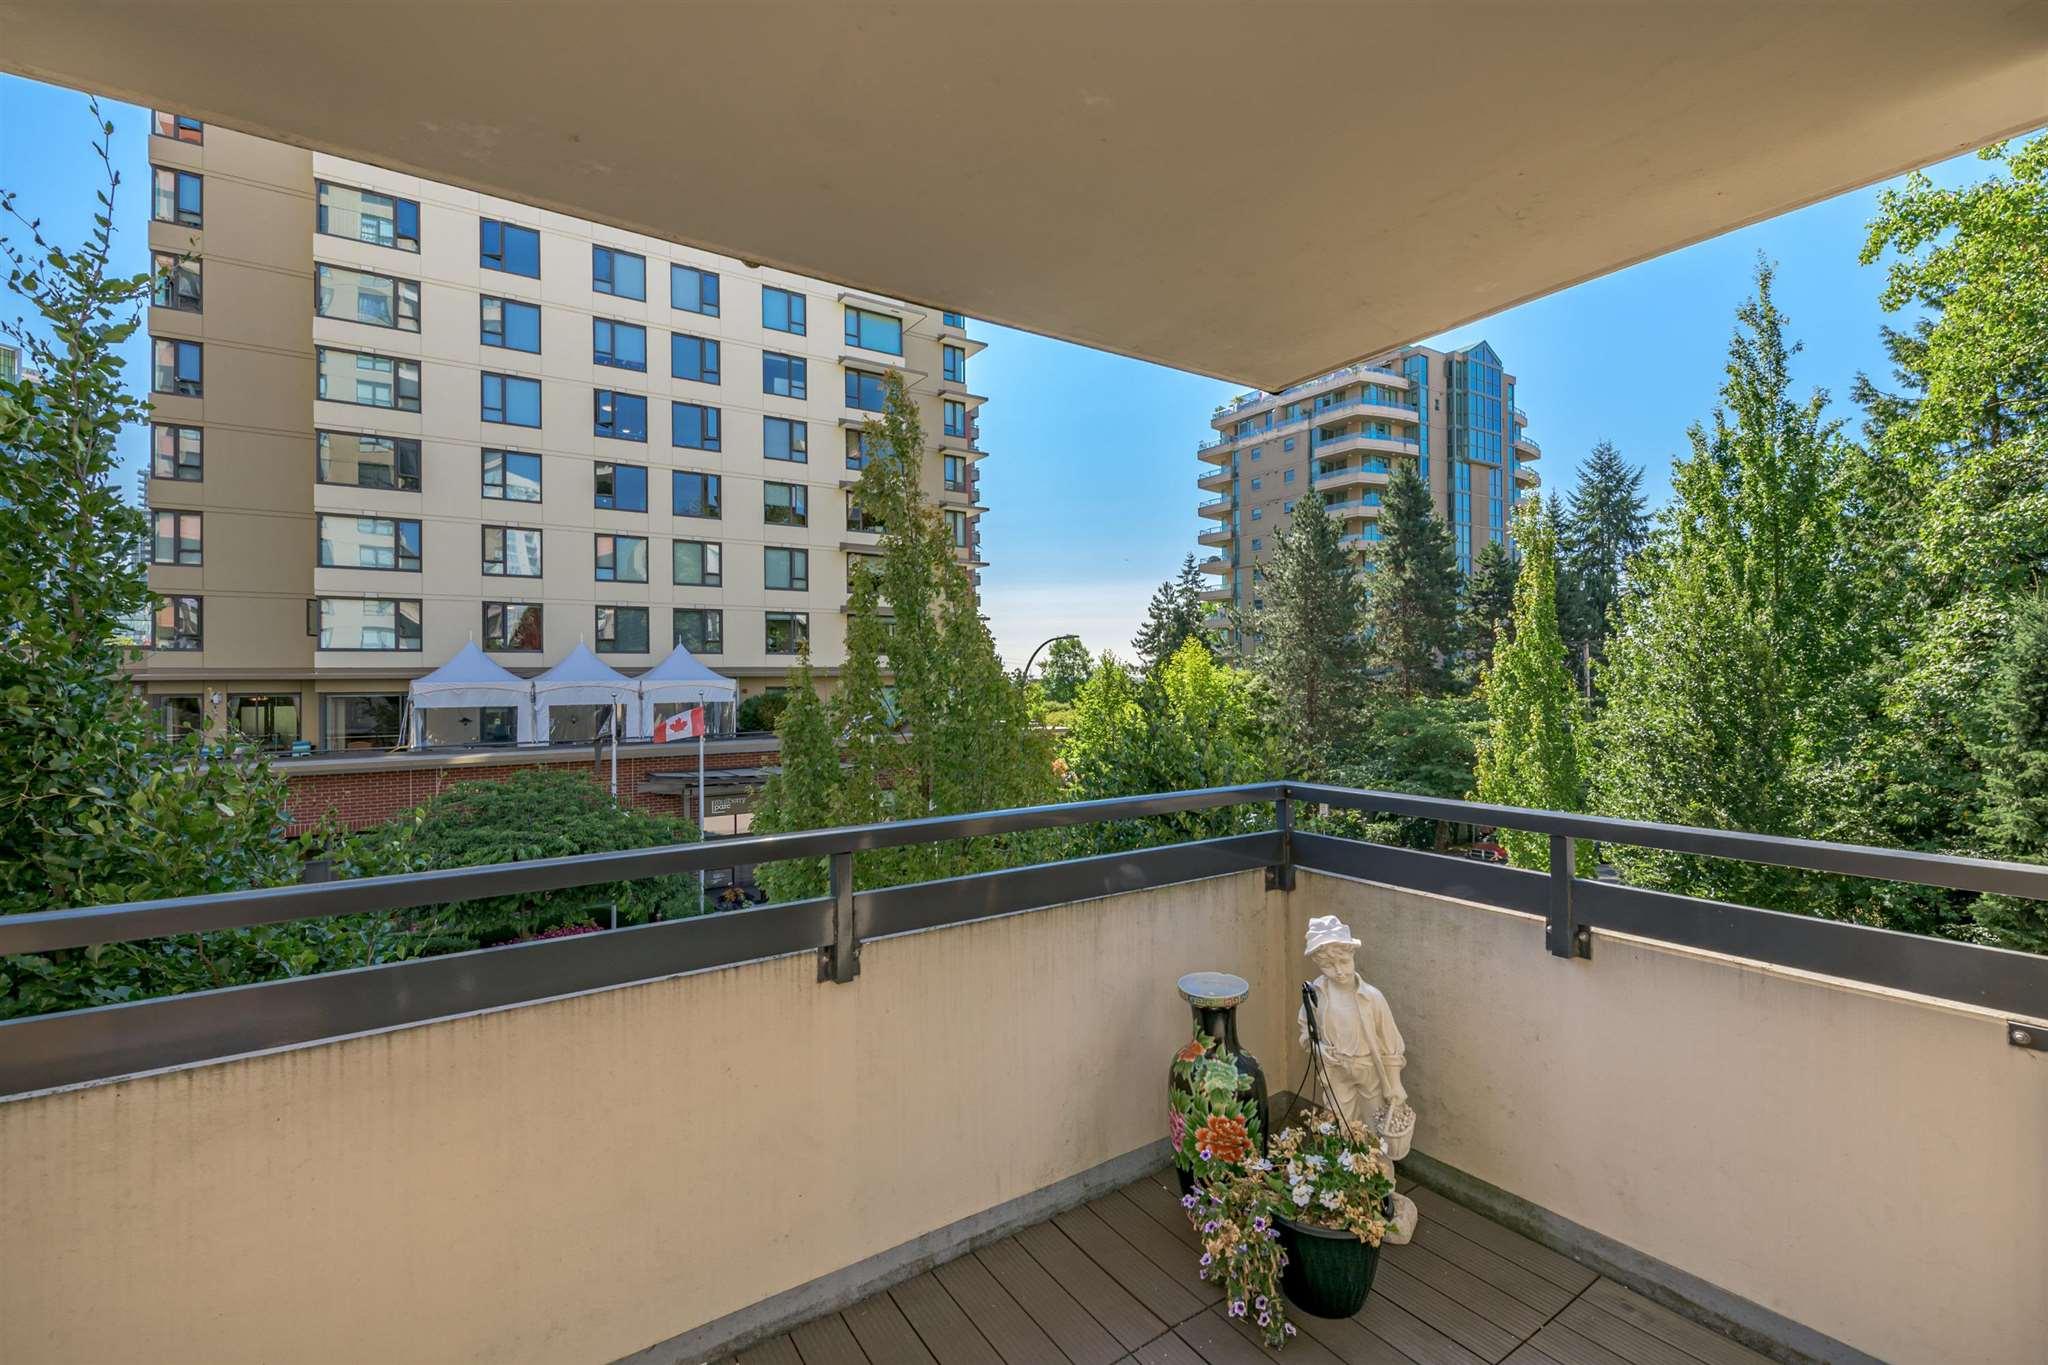 205 7225 ACORN AVENUE - Highgate Apartment/Condo for sale, 2 Bedrooms (R2606454) - #20